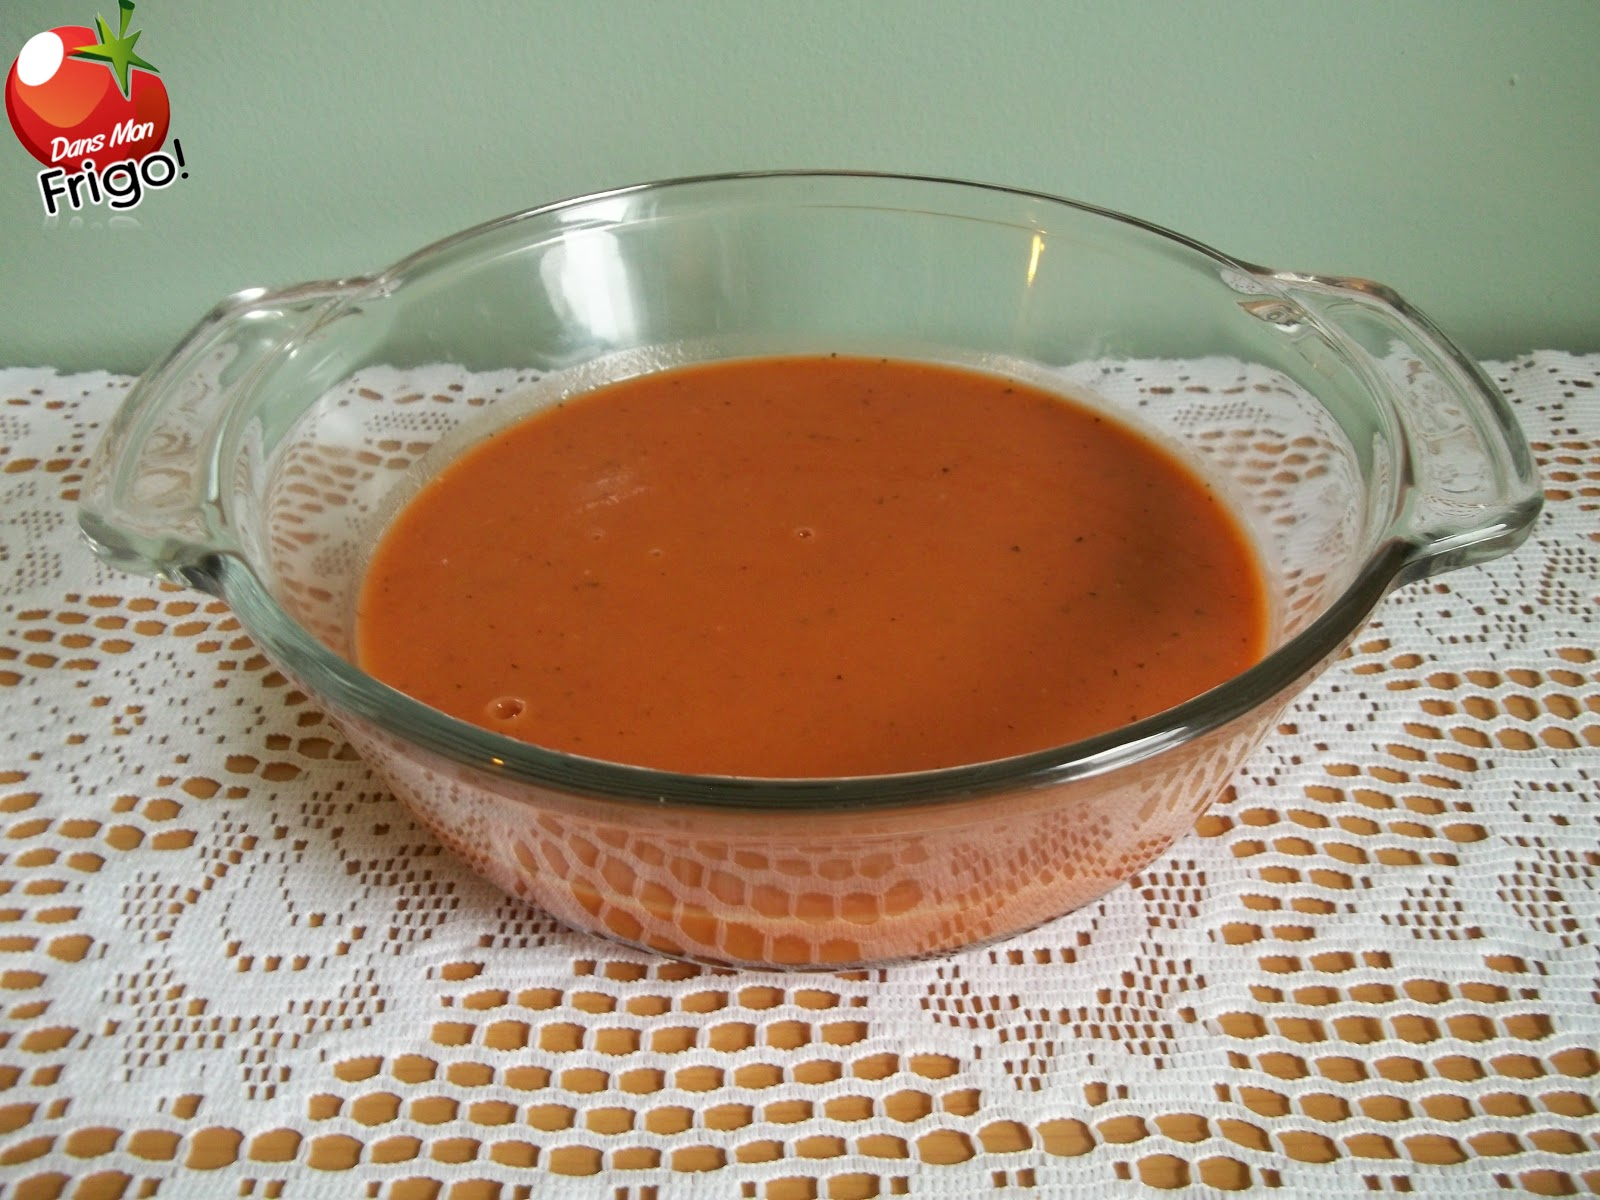 Dans mon frigo cr me de tomates for 750g dans mon frigo